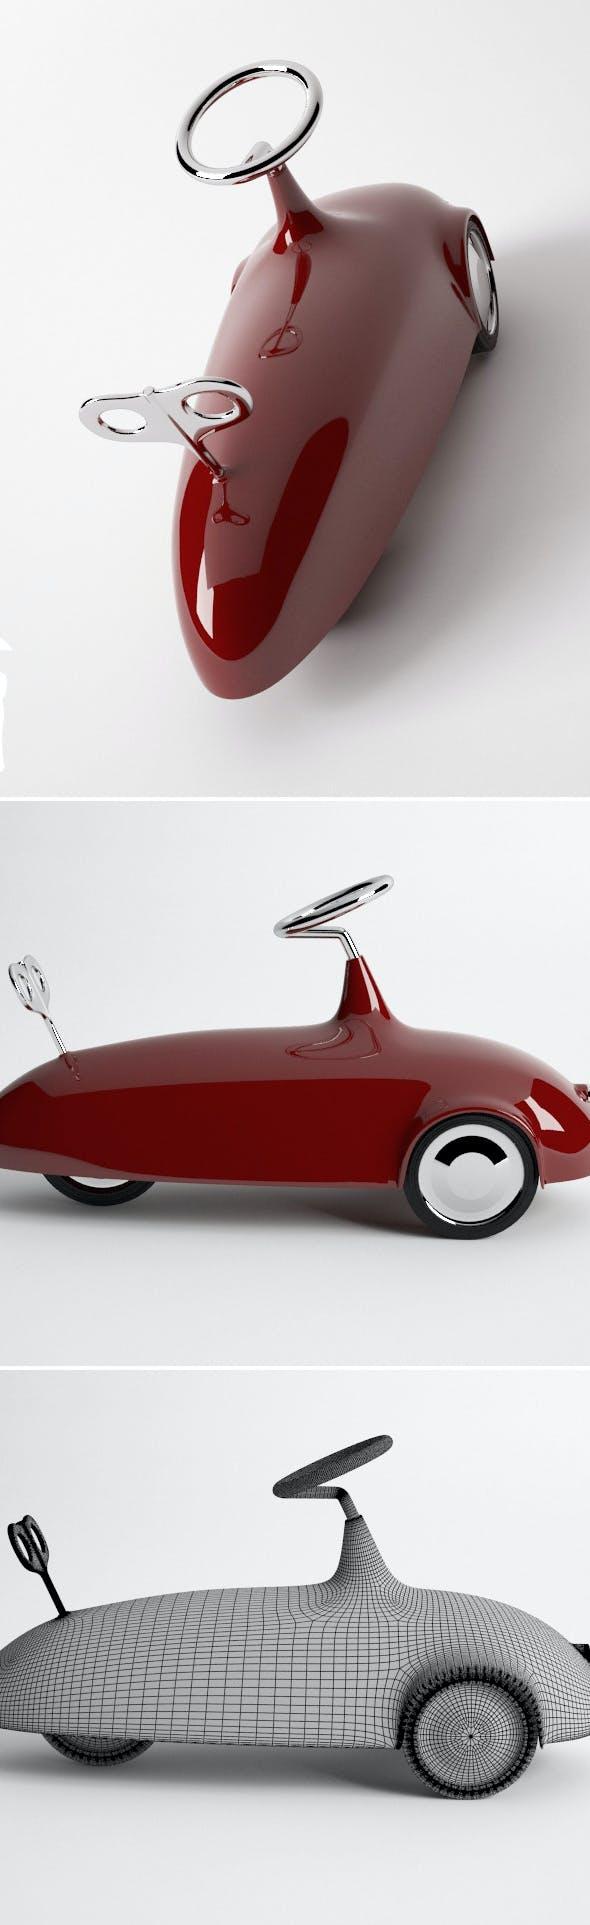 Konstantin_B toy car - 3DOcean Item for Sale